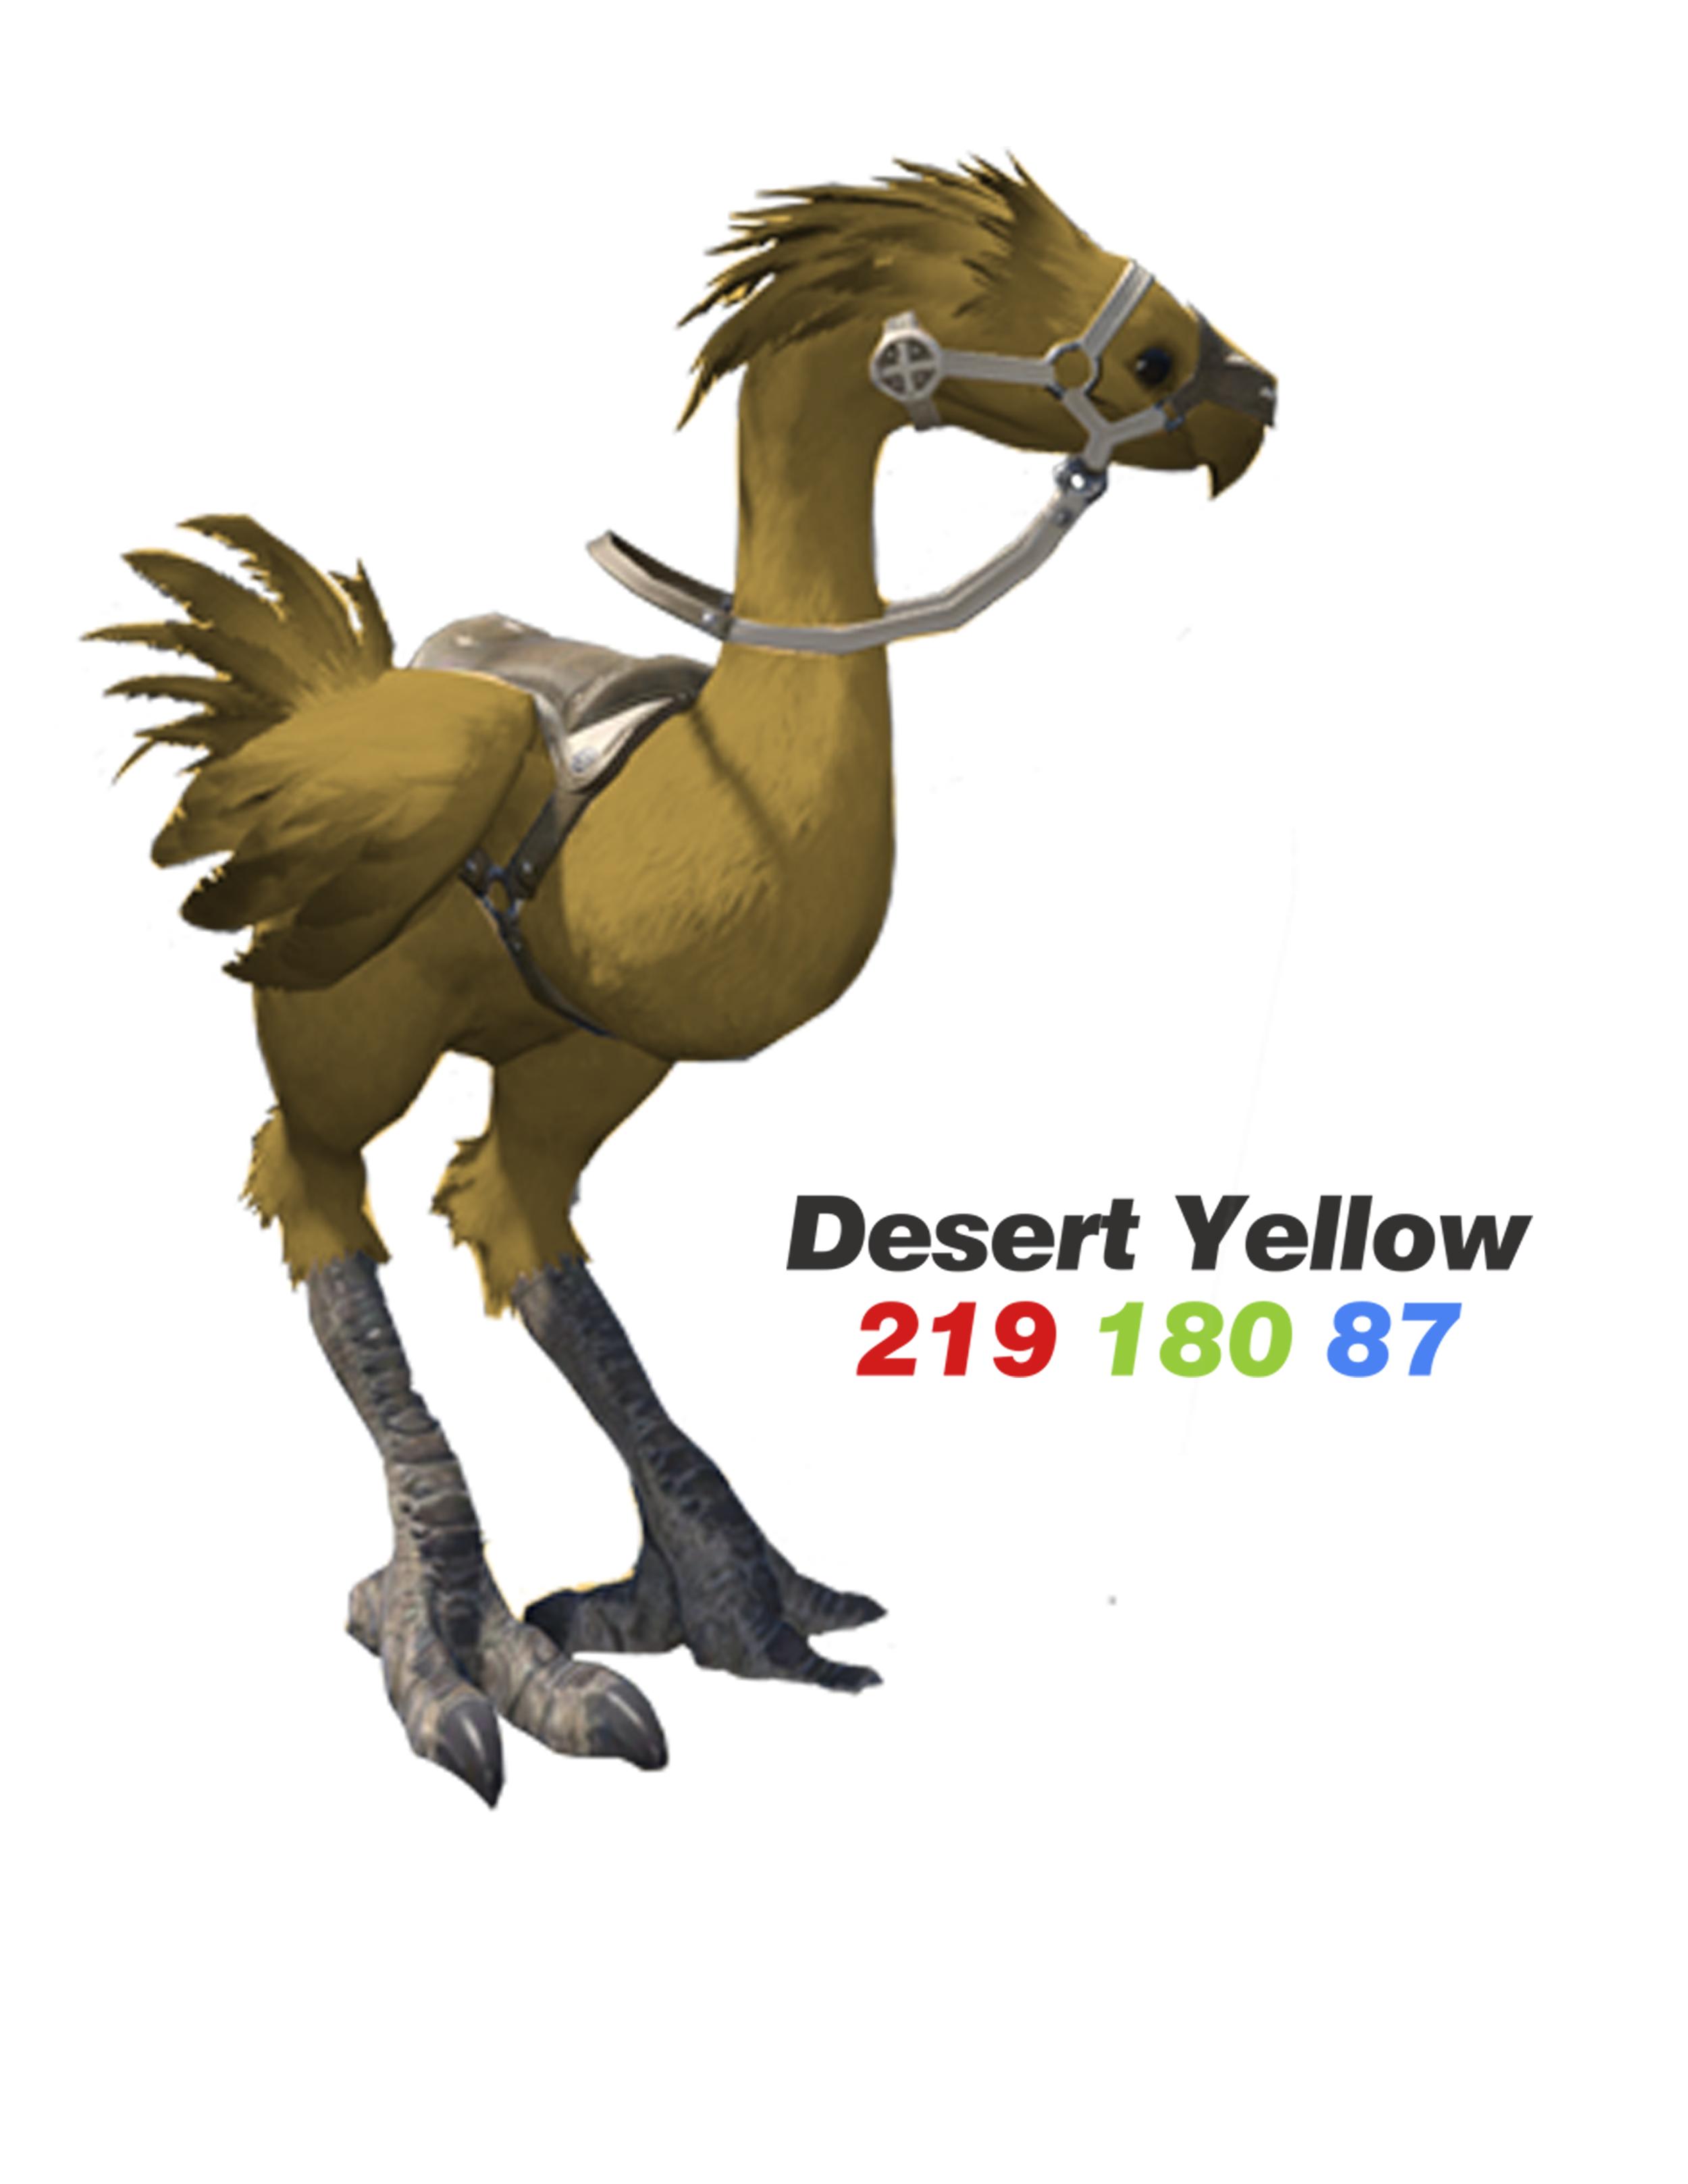 DesertYellow.png